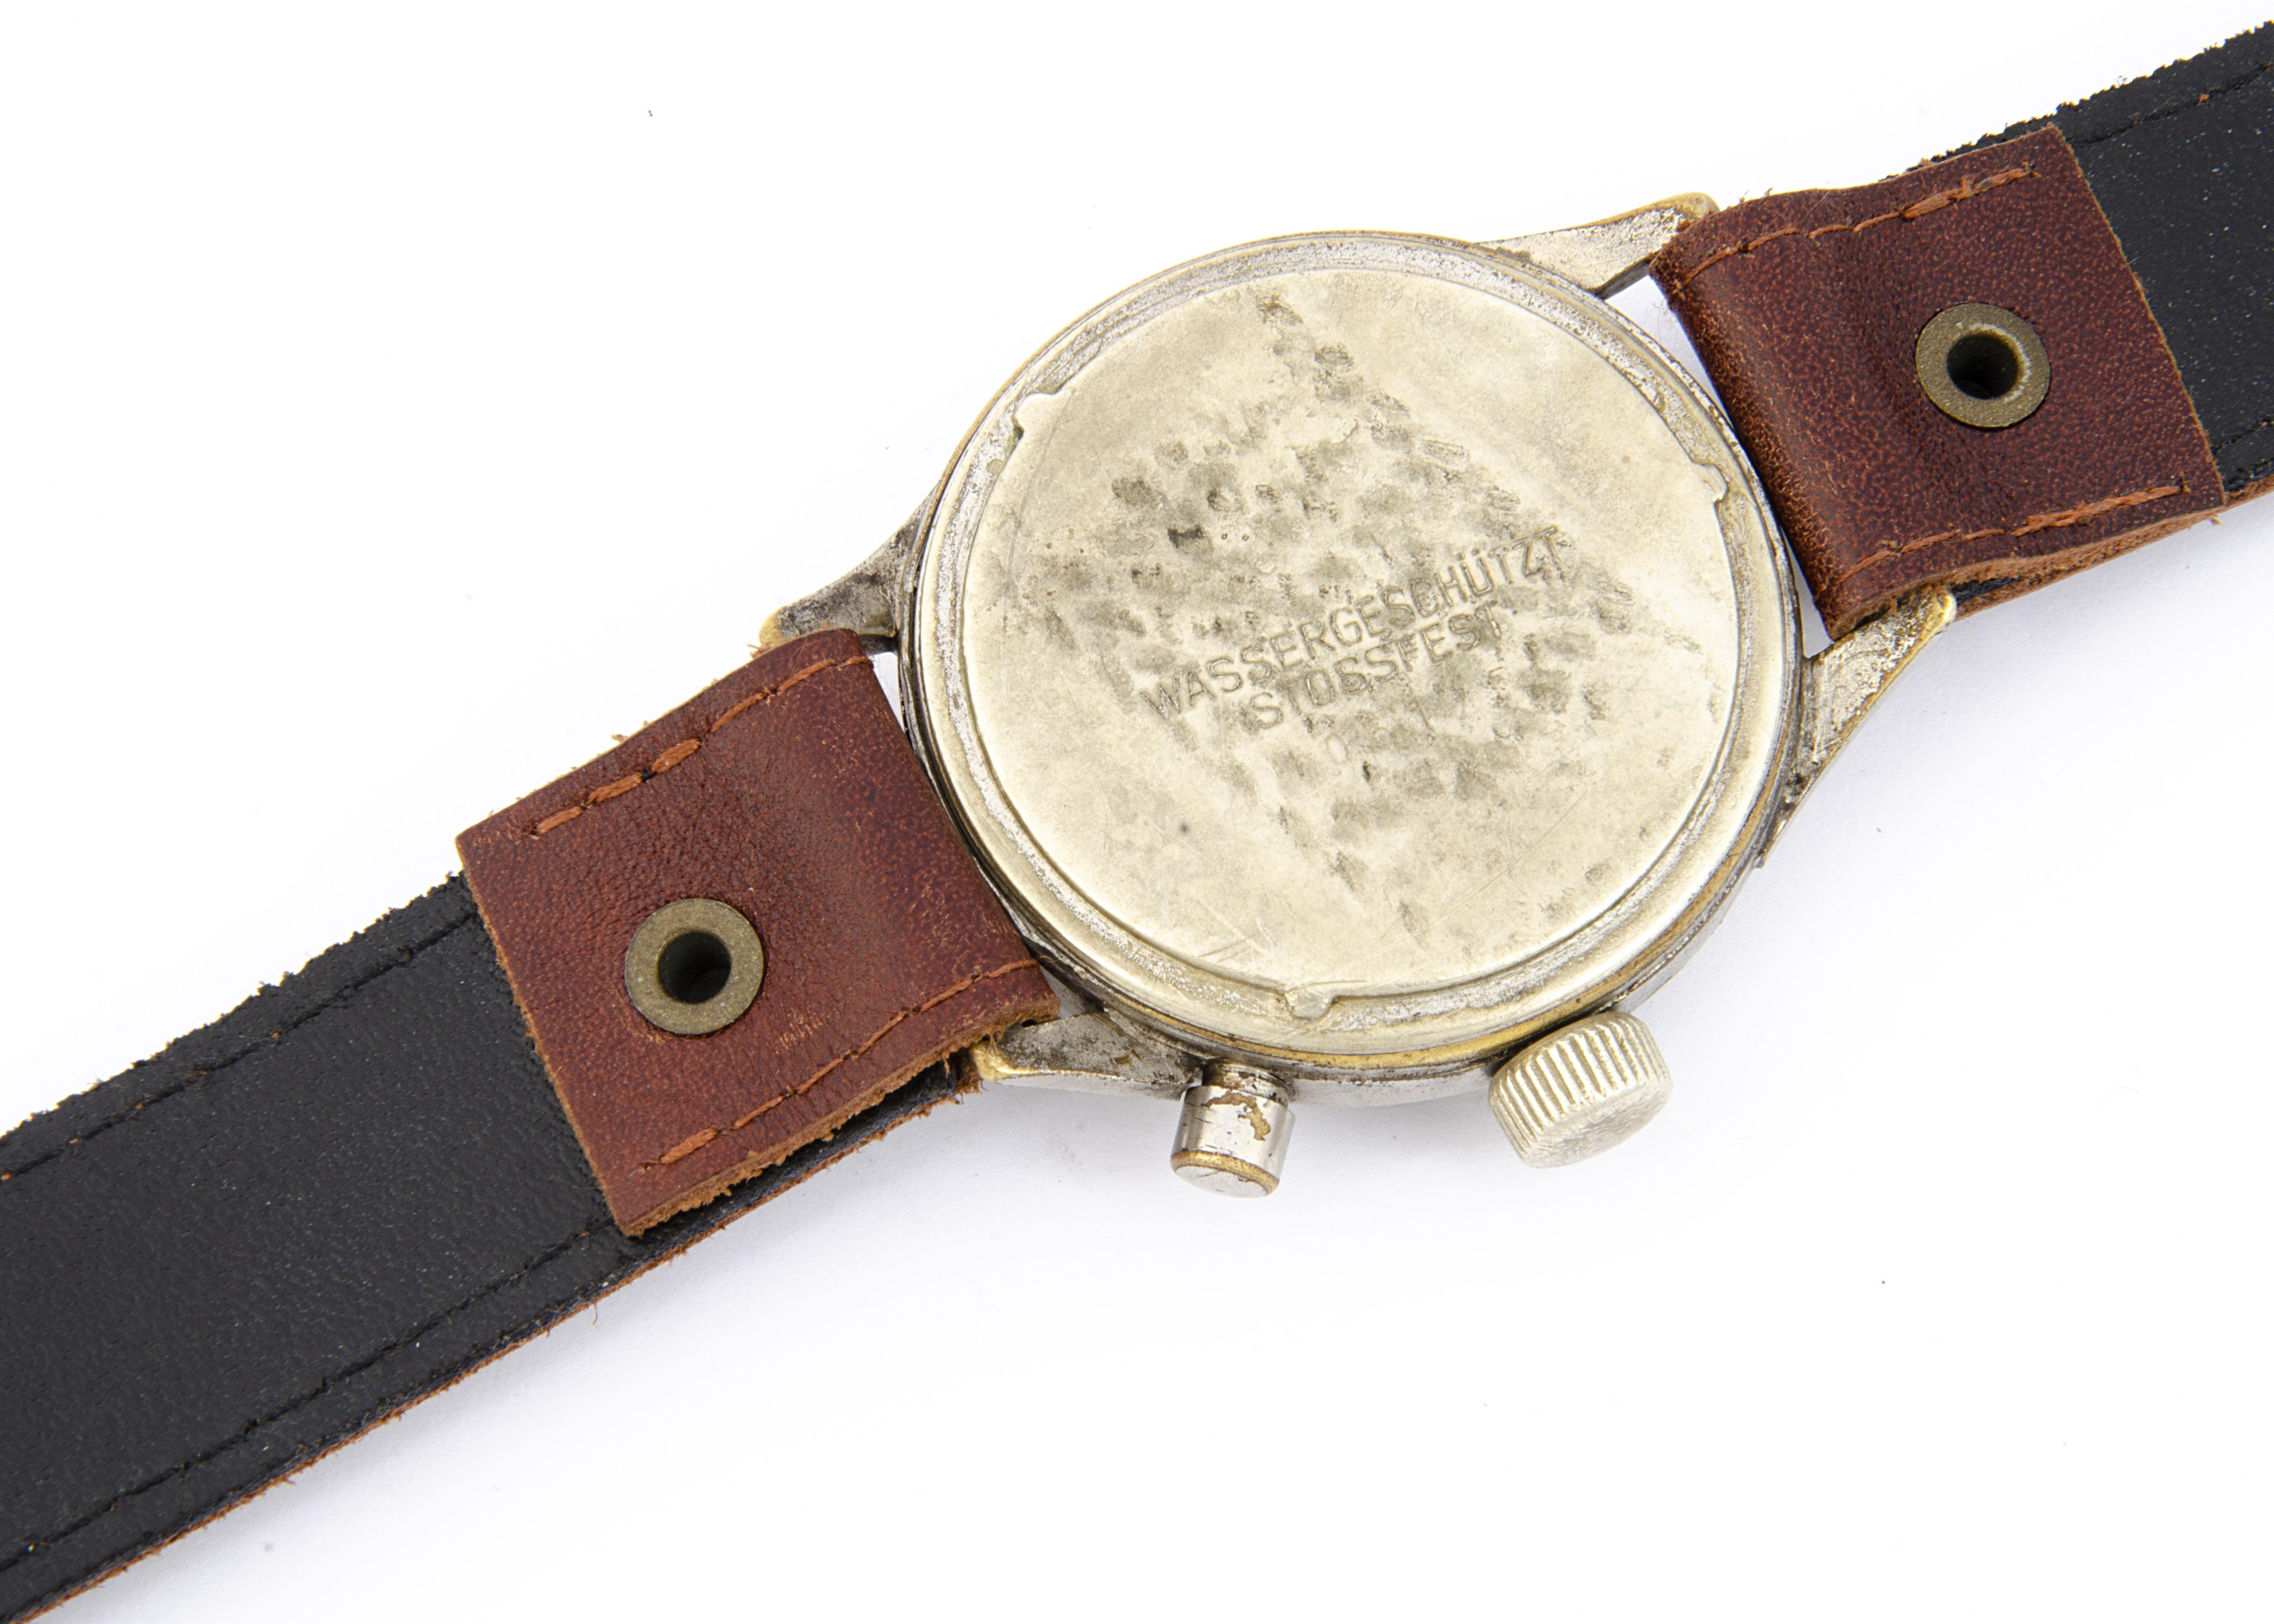 A WWII period Hanhart German Luftwaffe chronograph wristwatch, 40mm plated nickel case, running, - Image 6 of 6